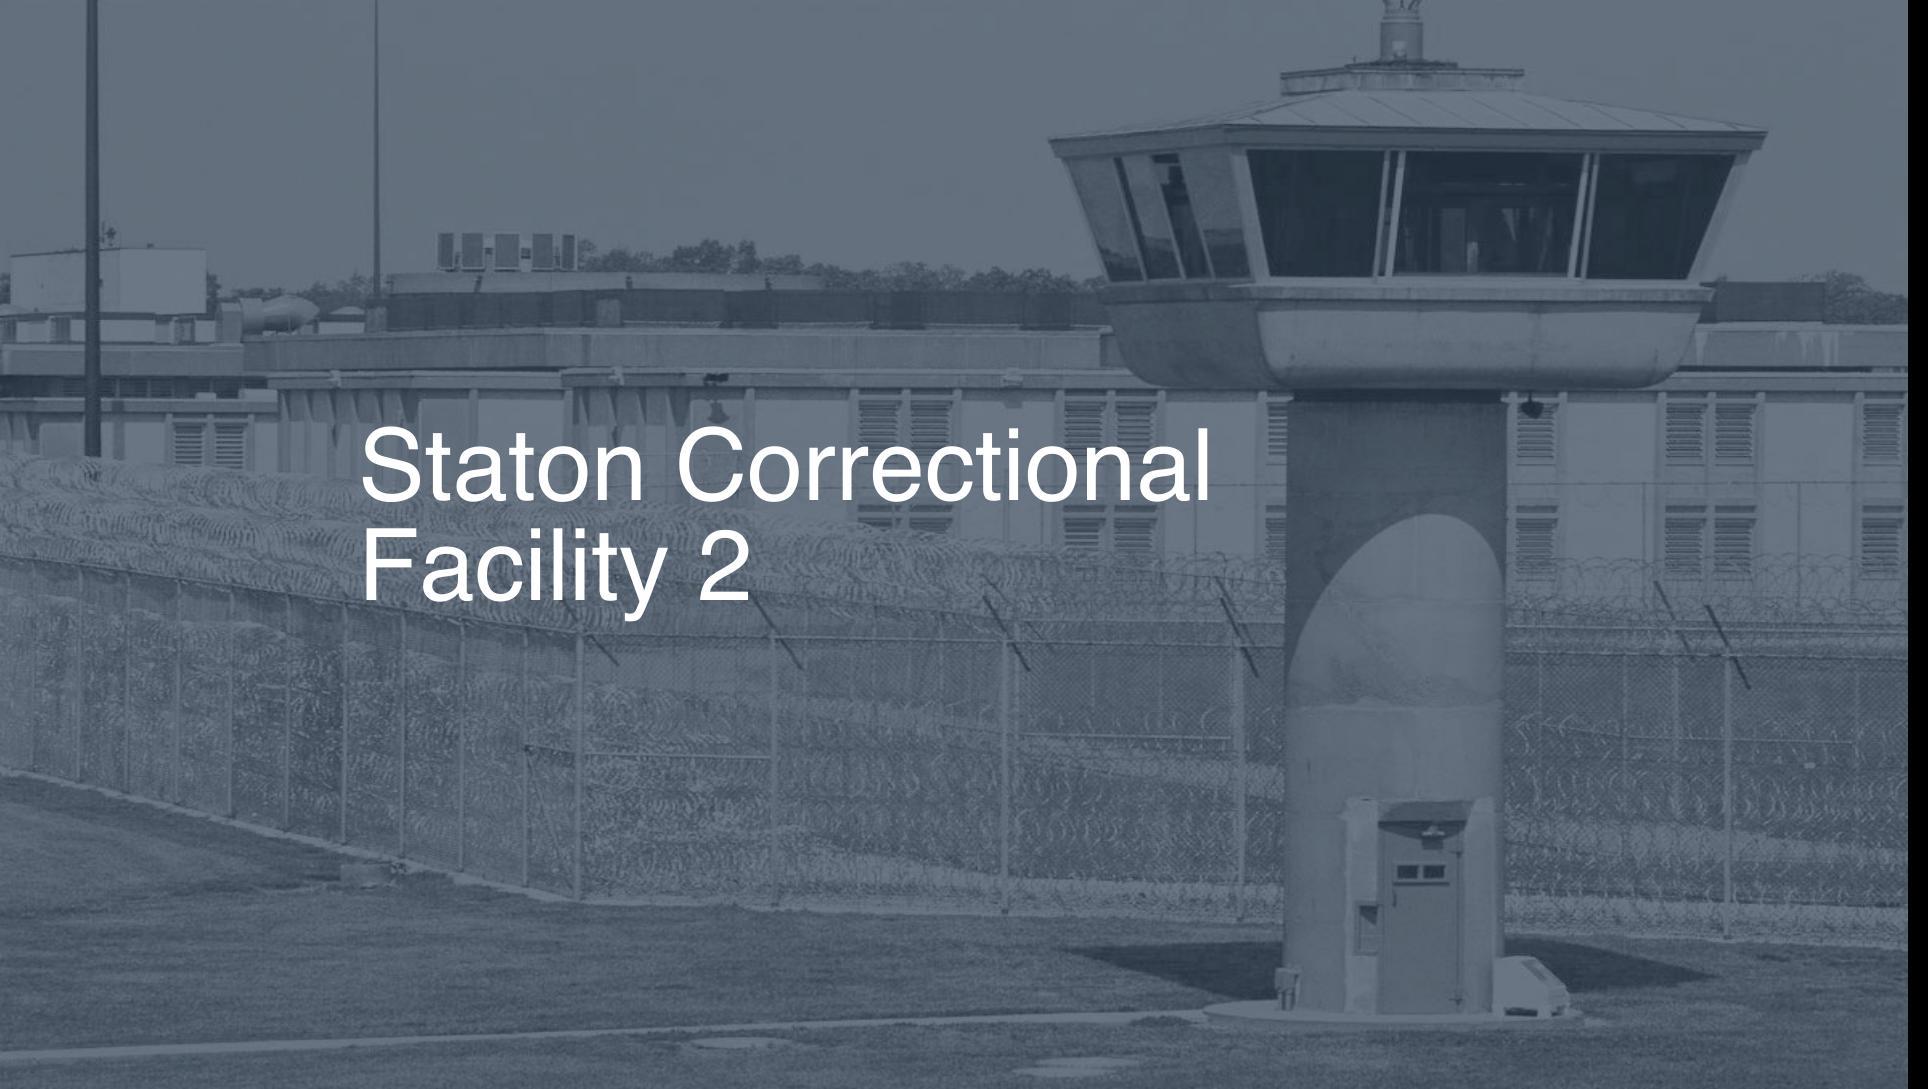 Staton Correctional Facility correctional facility picture